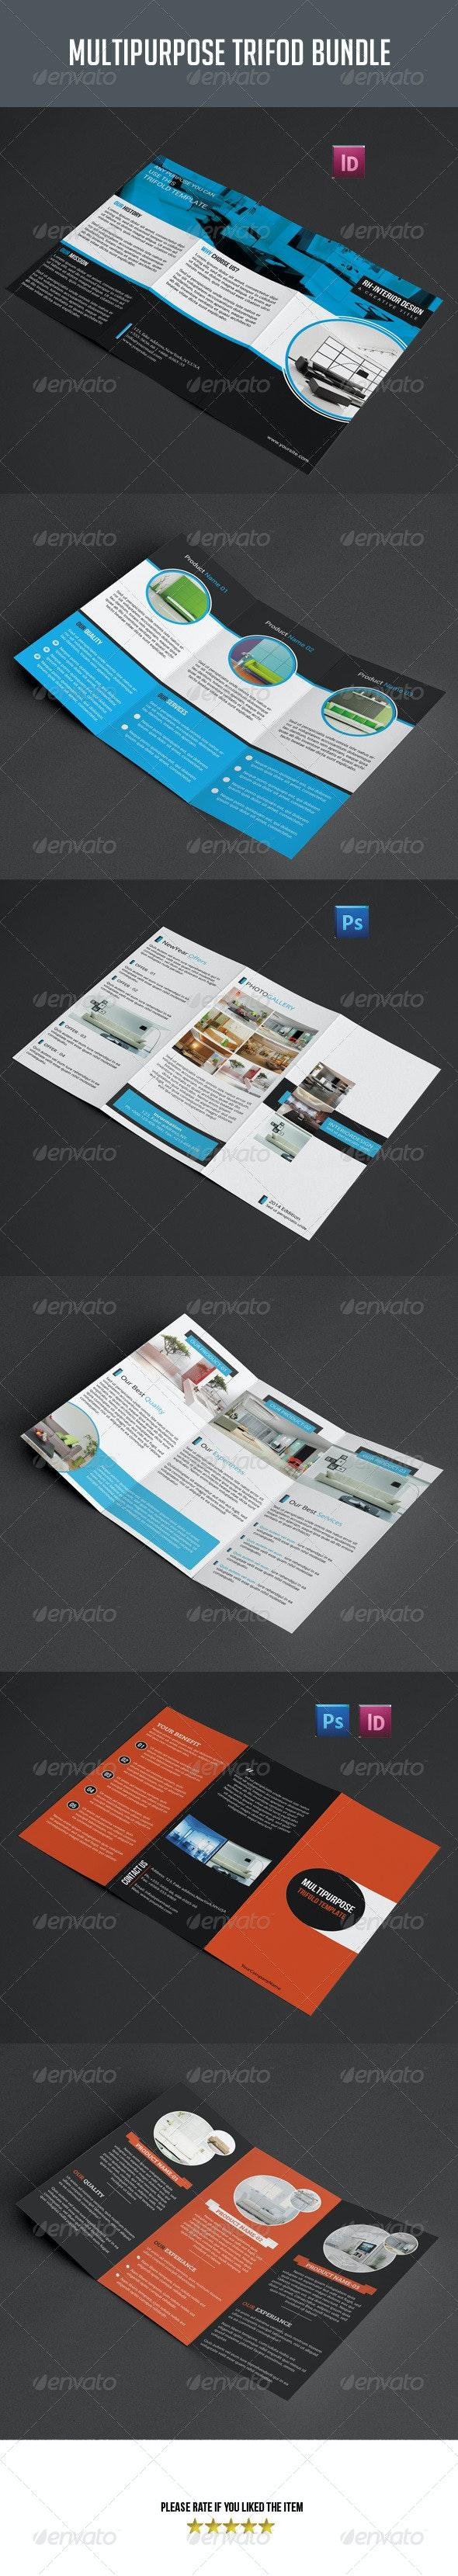 3 in 1 Multipurpose Trifold Brochure Bundle - Corporate Brochures